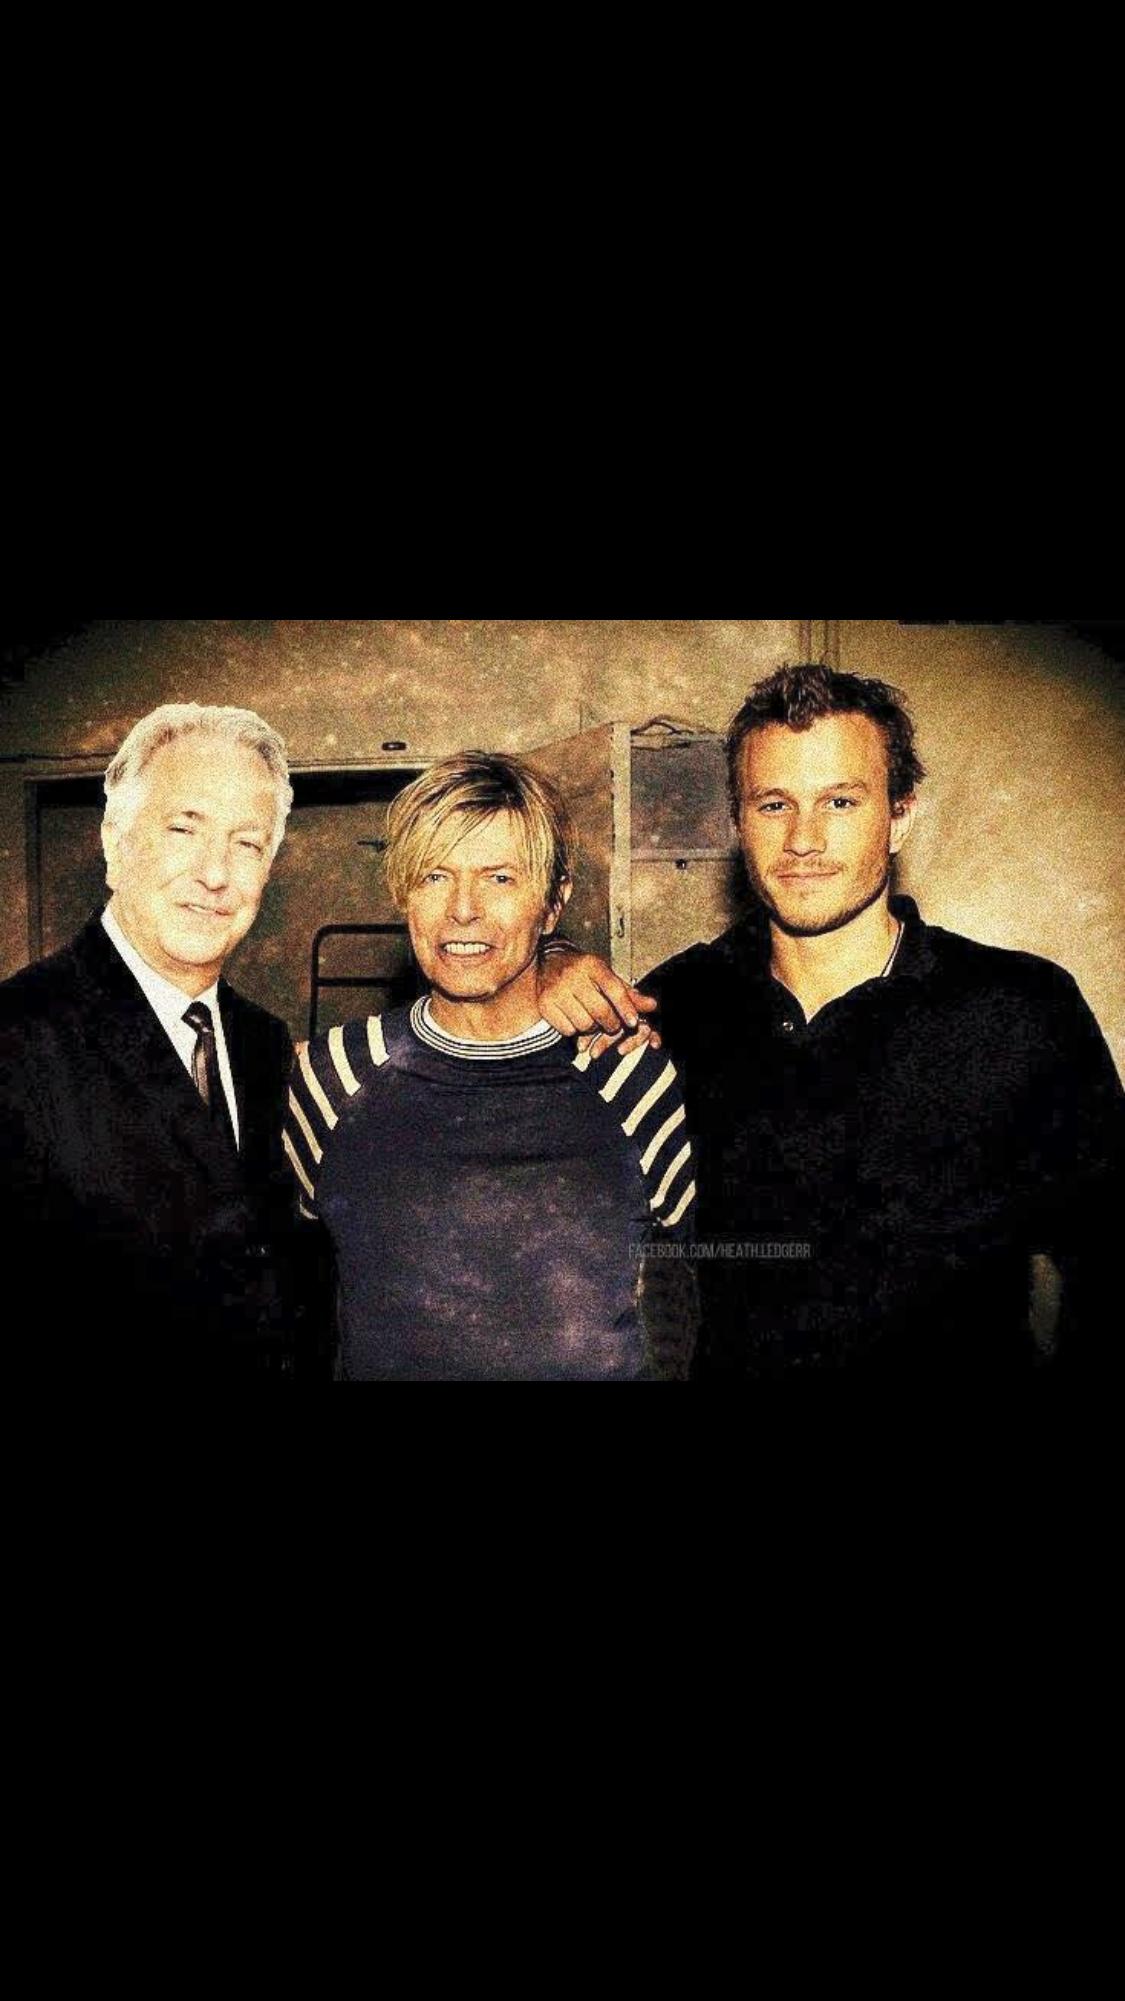 Alan Rickman, David Bowie, and Heath Ledger❤️..,